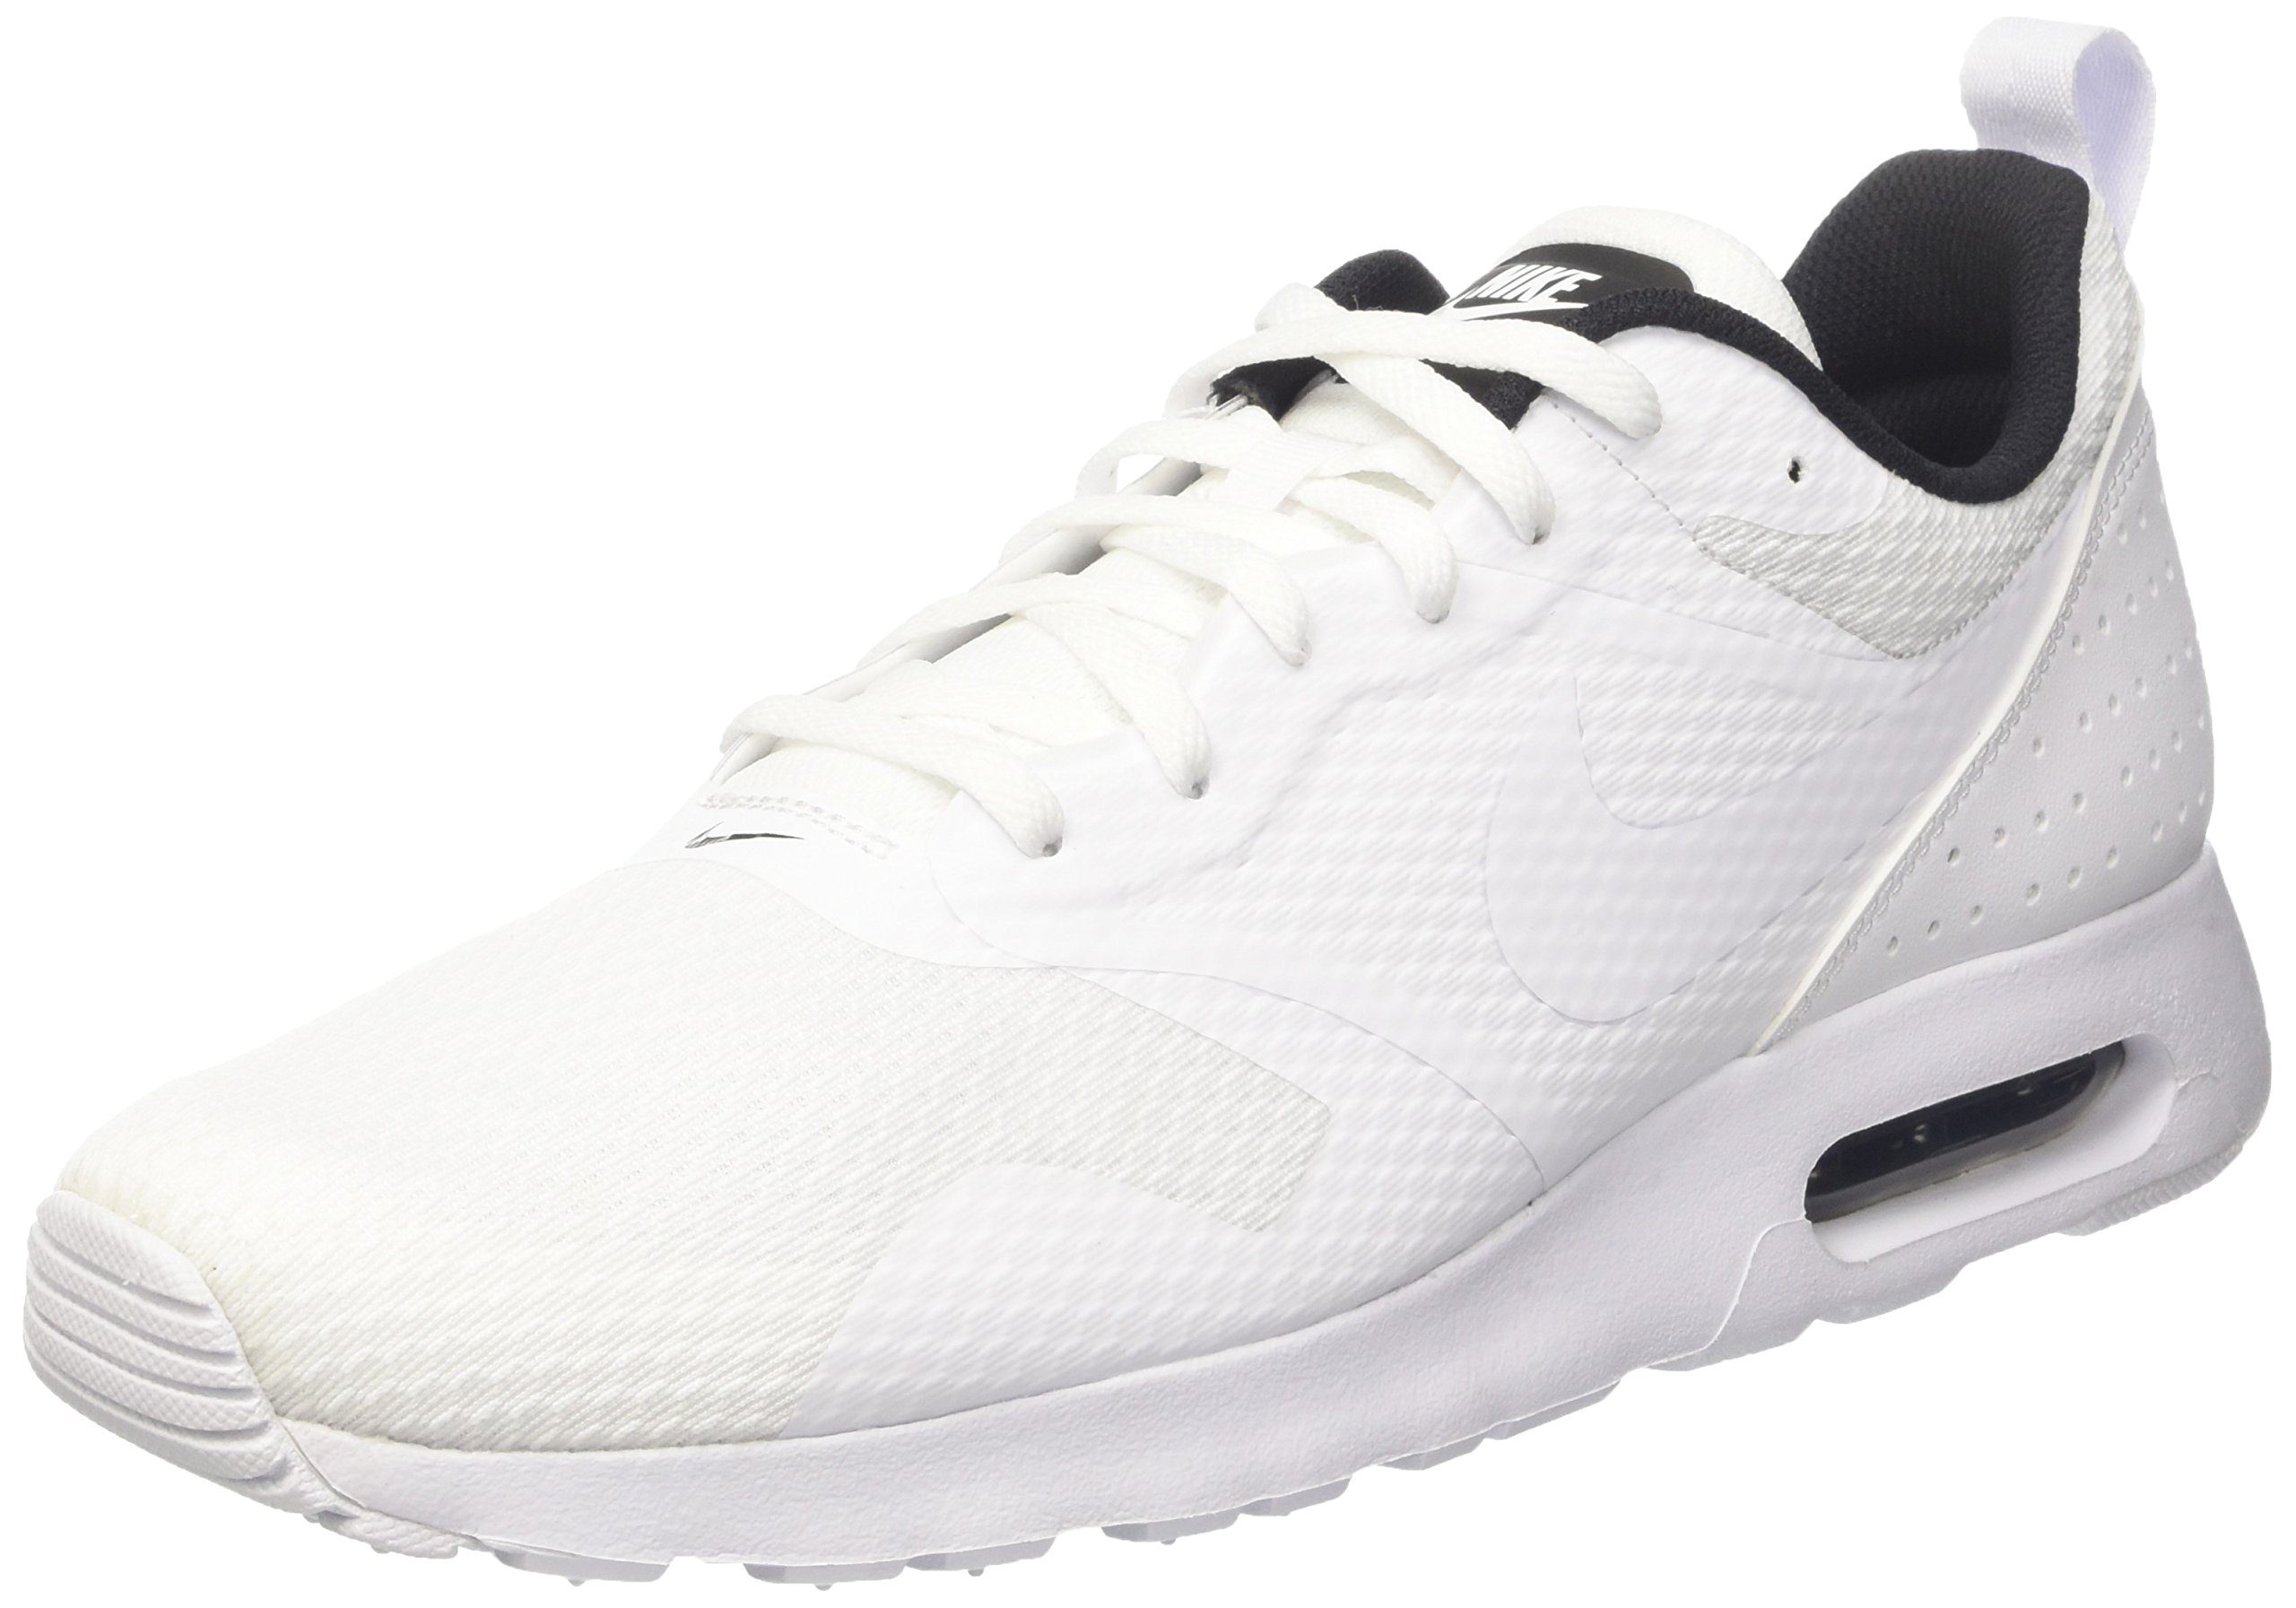 94d34f839e Galleon - Nike Air Max Tavas Running Shoes White/White-Black (8.5 US)